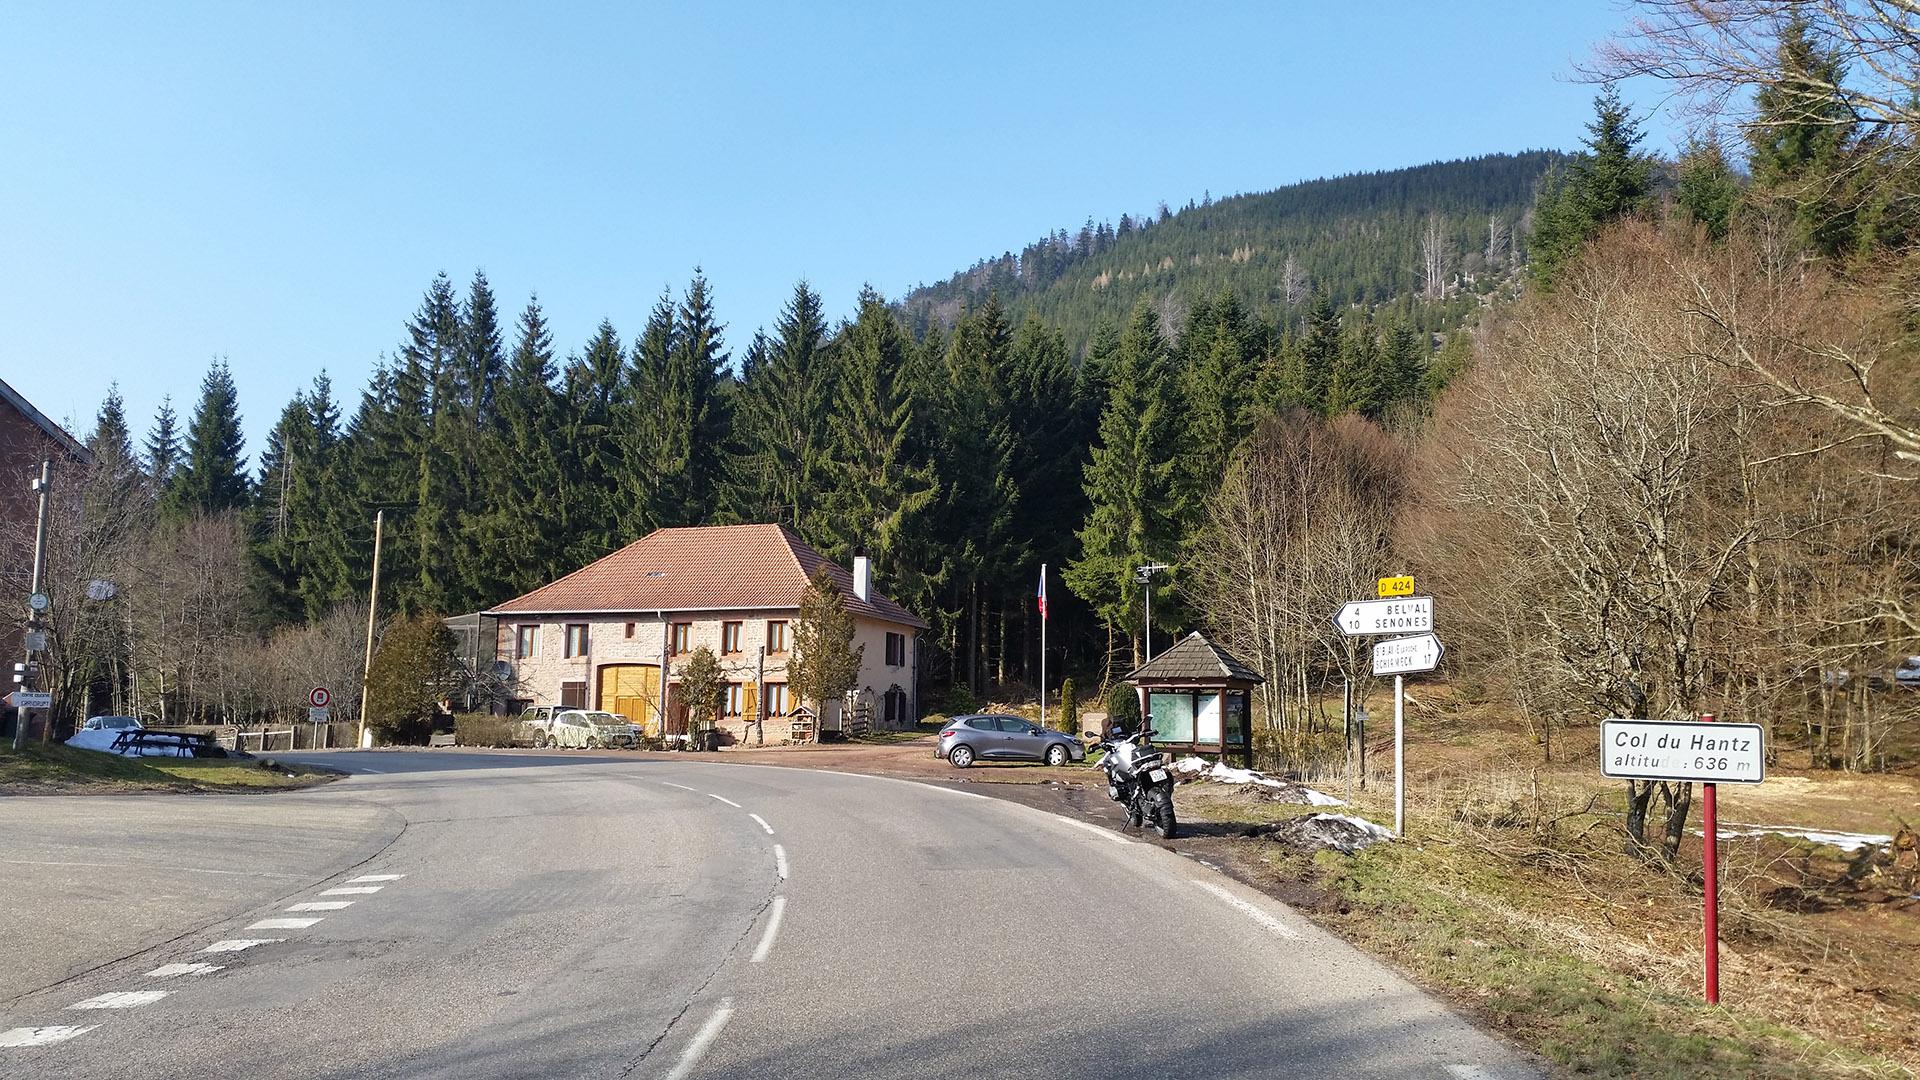 0636 - F - Col du Hantz